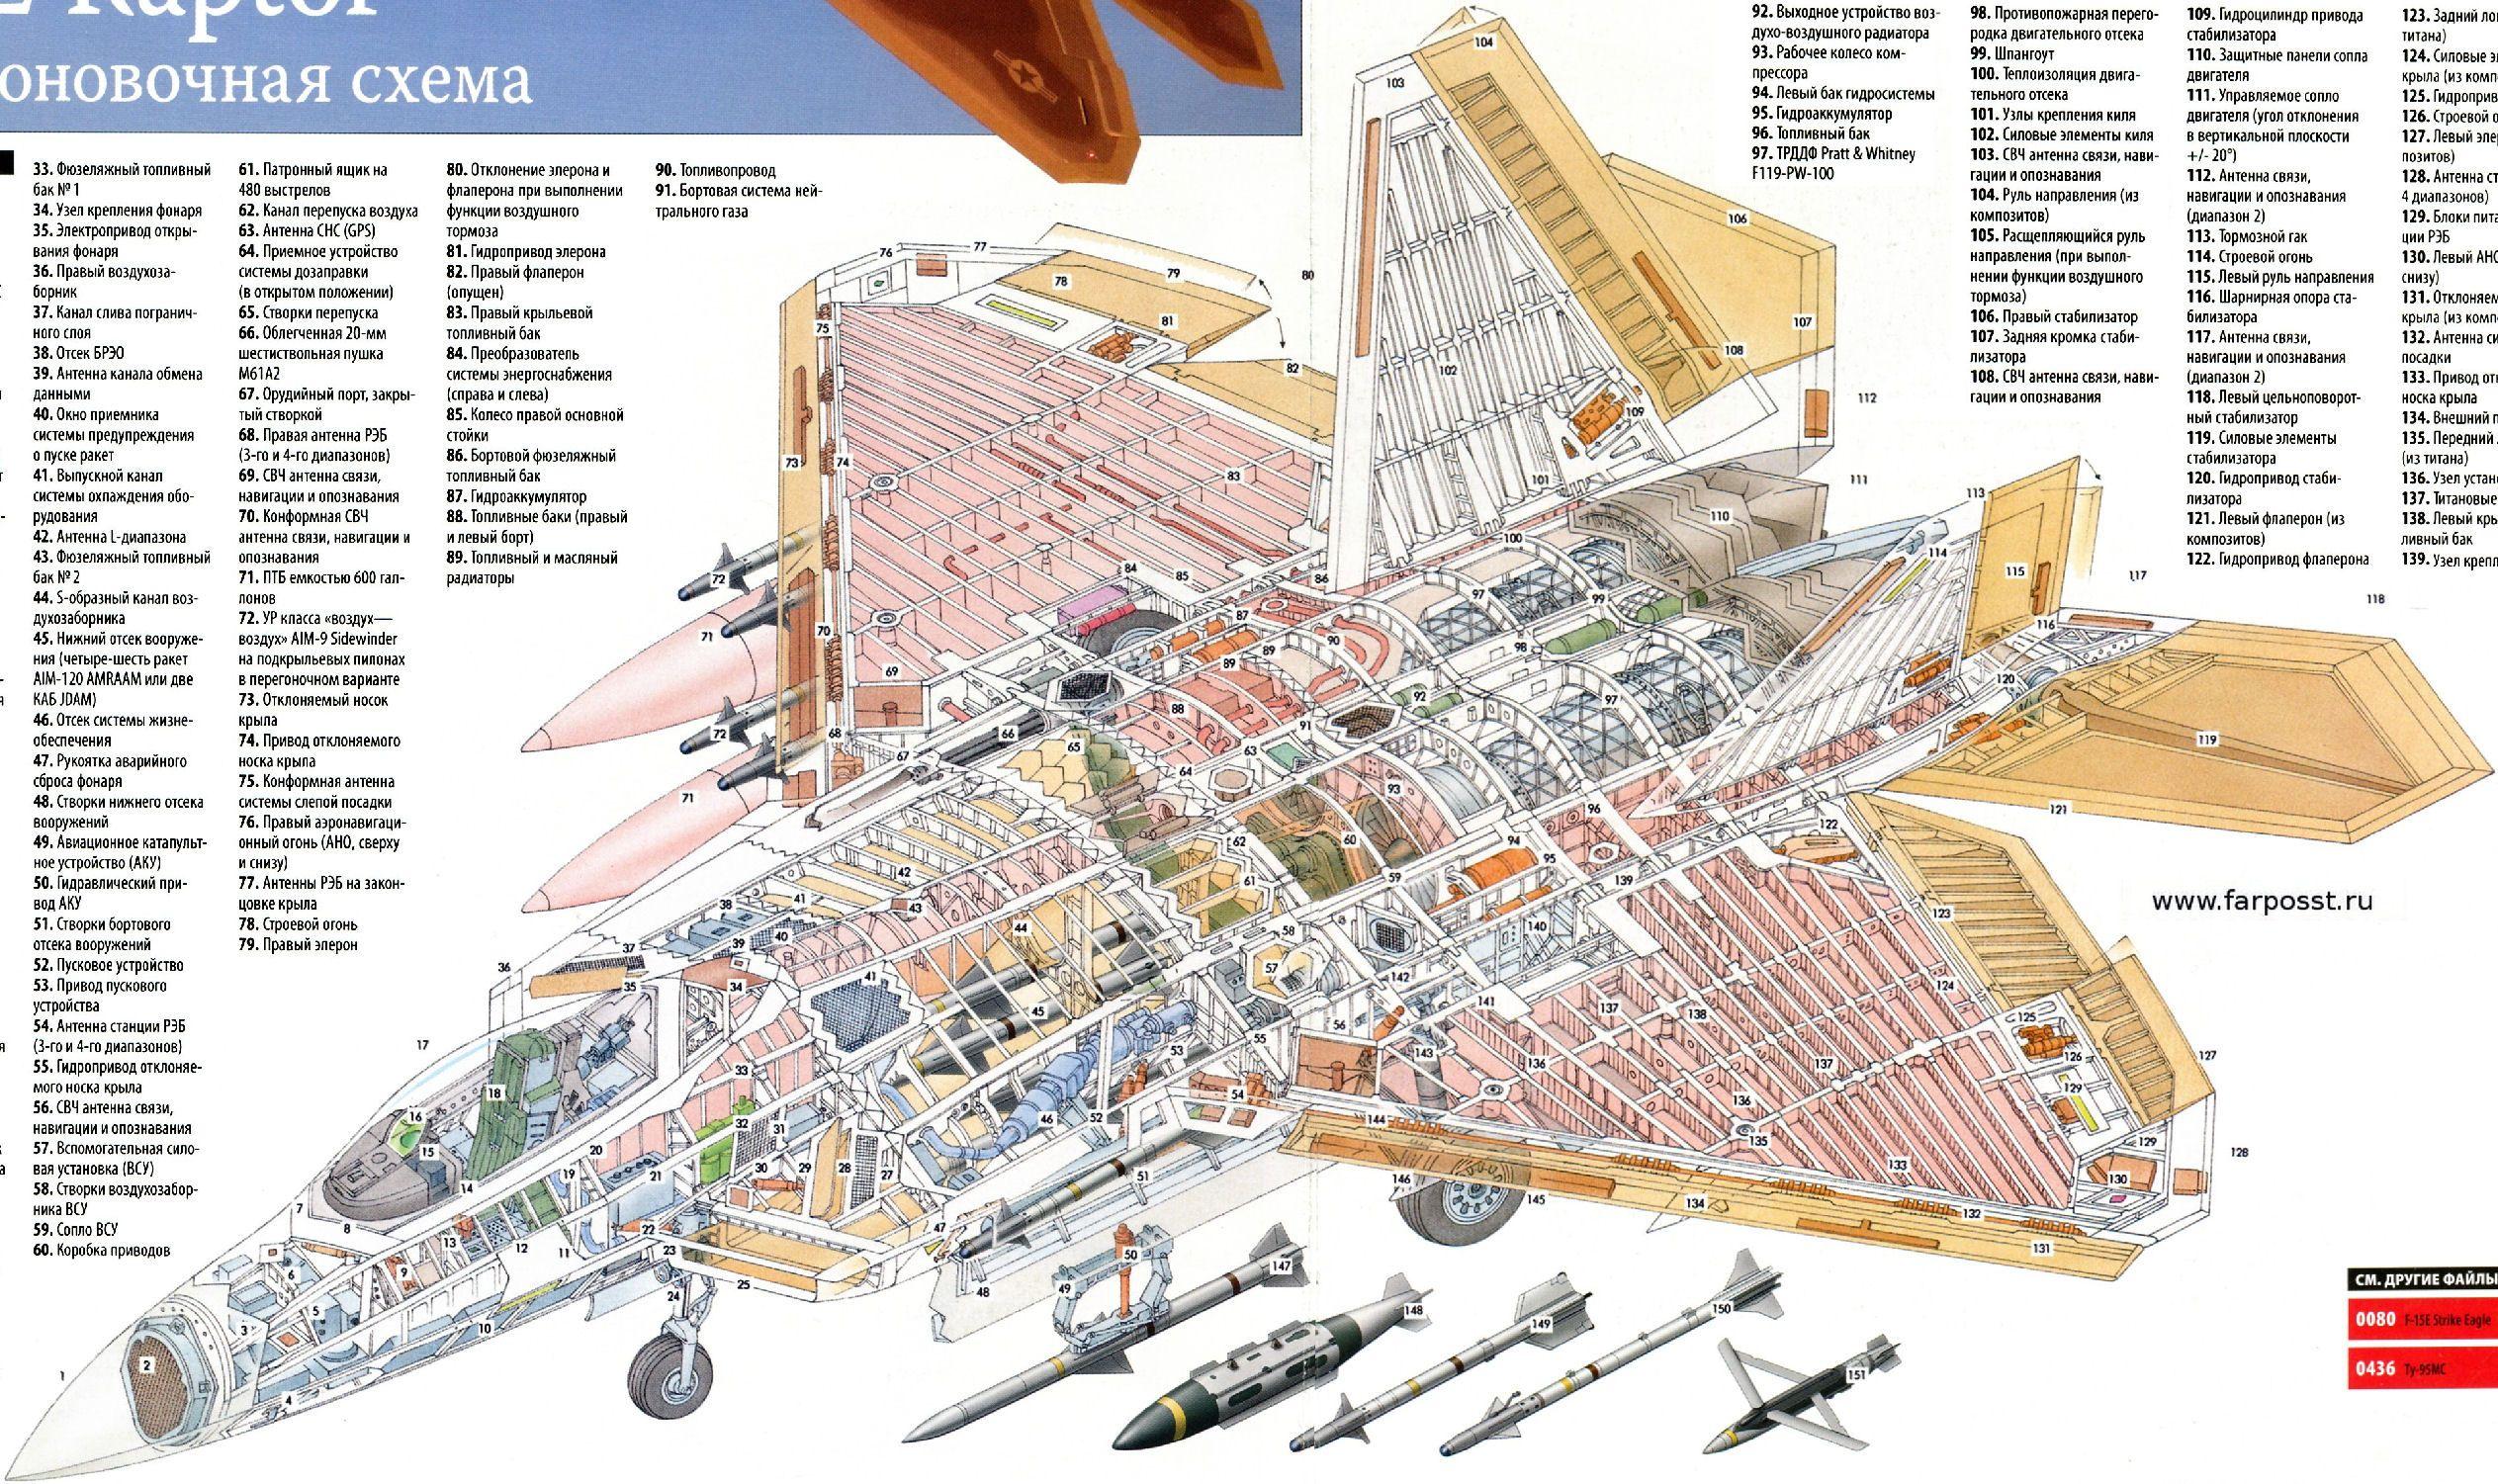 cutaways page 2 ed forums airplanes aviones de. Black Bedroom Furniture Sets. Home Design Ideas